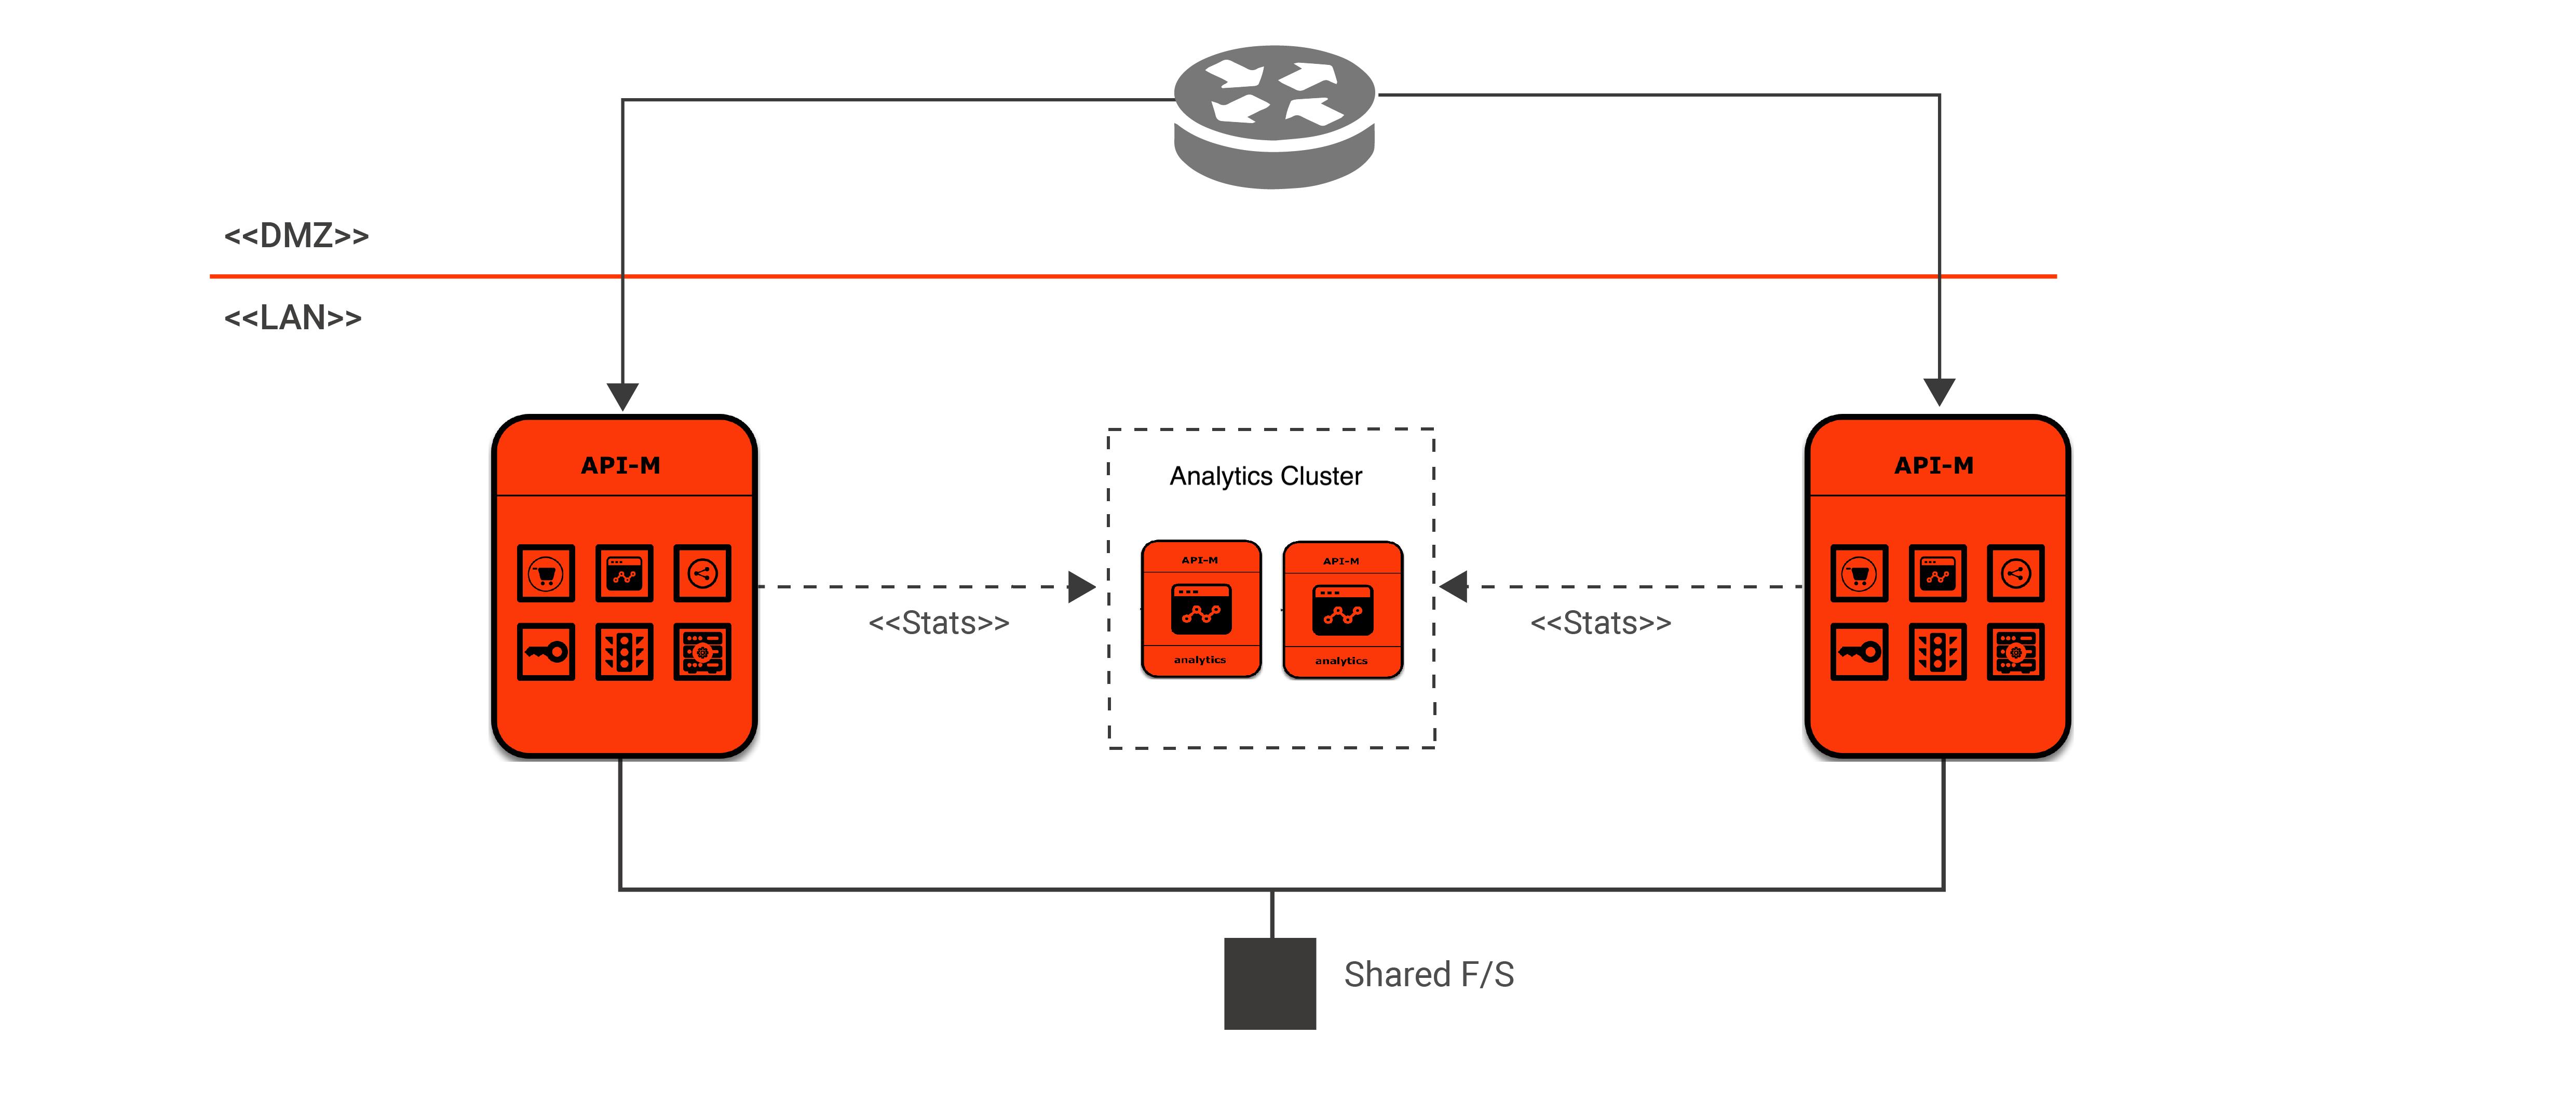 Single node deployment